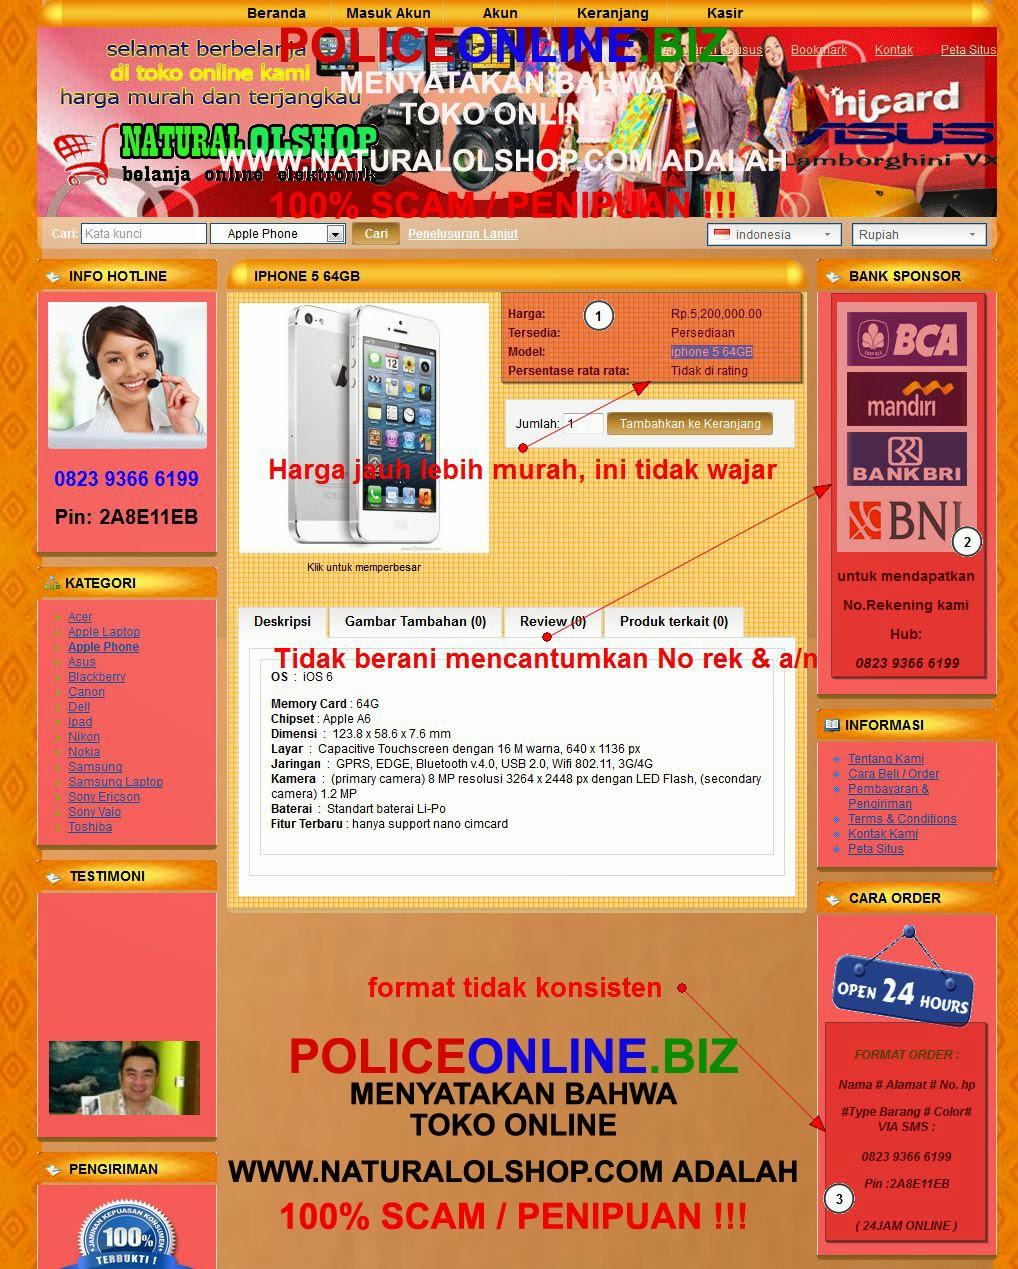 www.naturalolshop.com toko online 100% PENIPU / SCAM